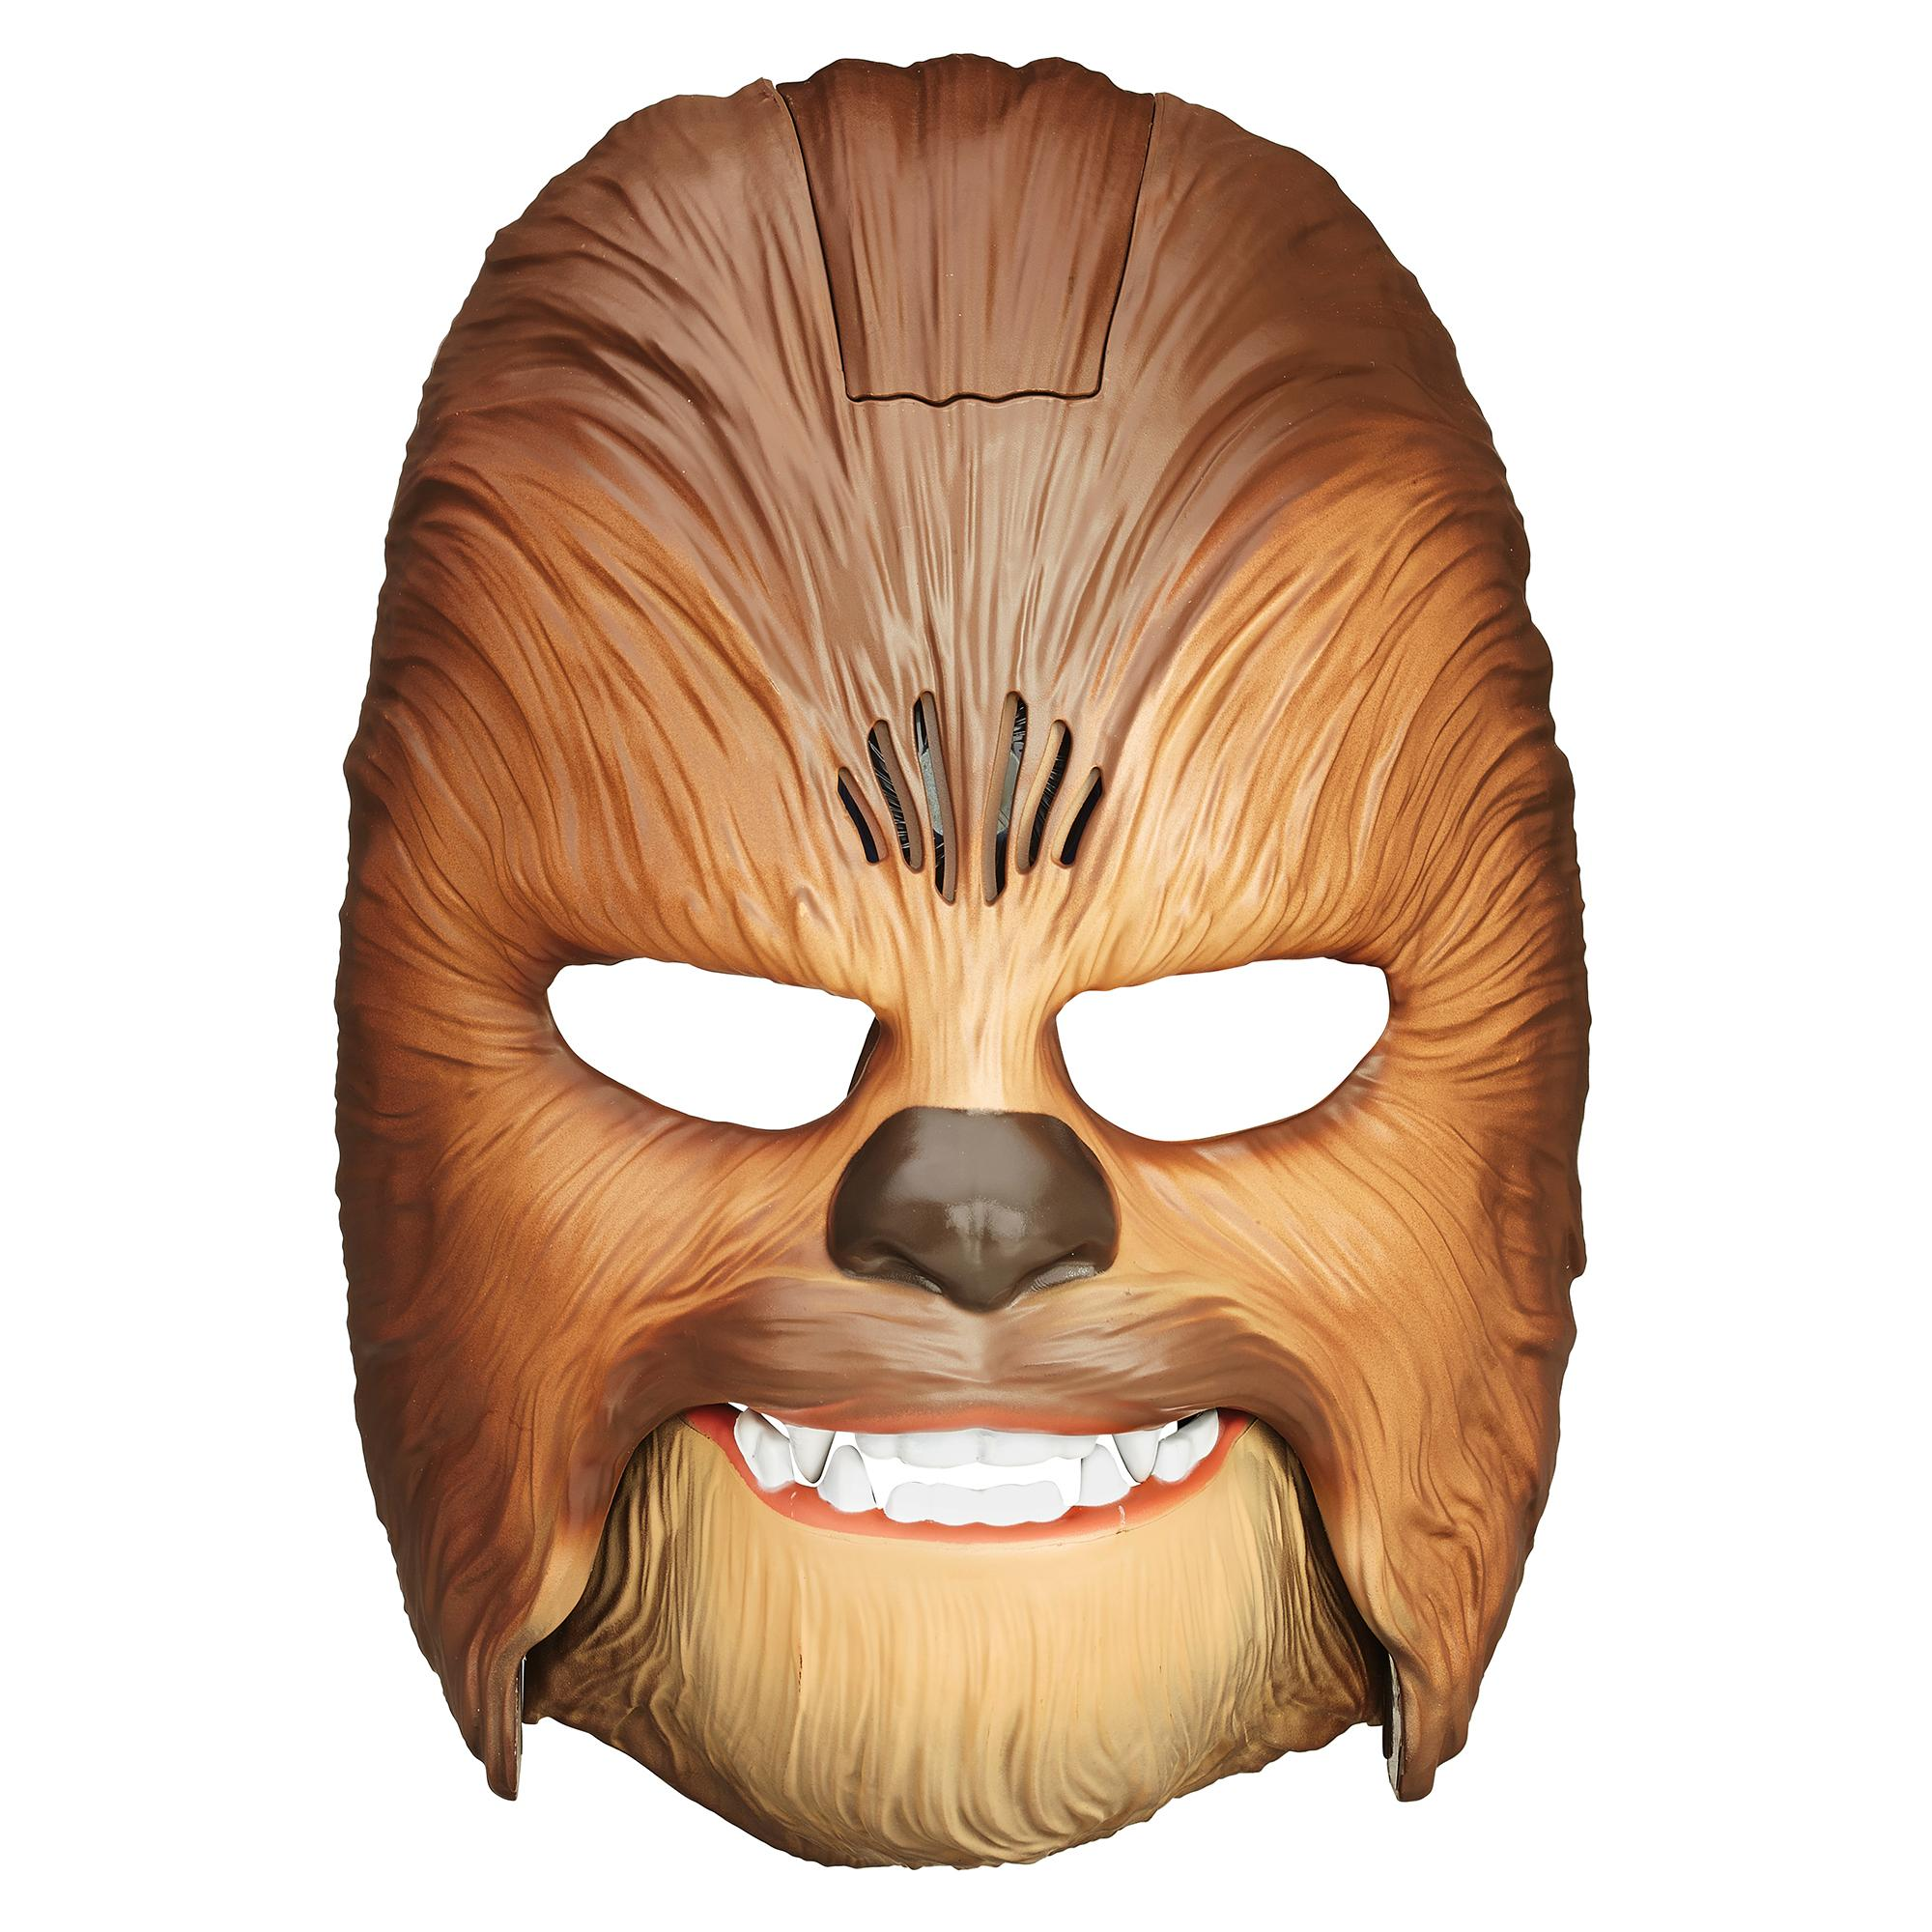 Star Wars Kraften våkner Chewbacca elektronisk maske